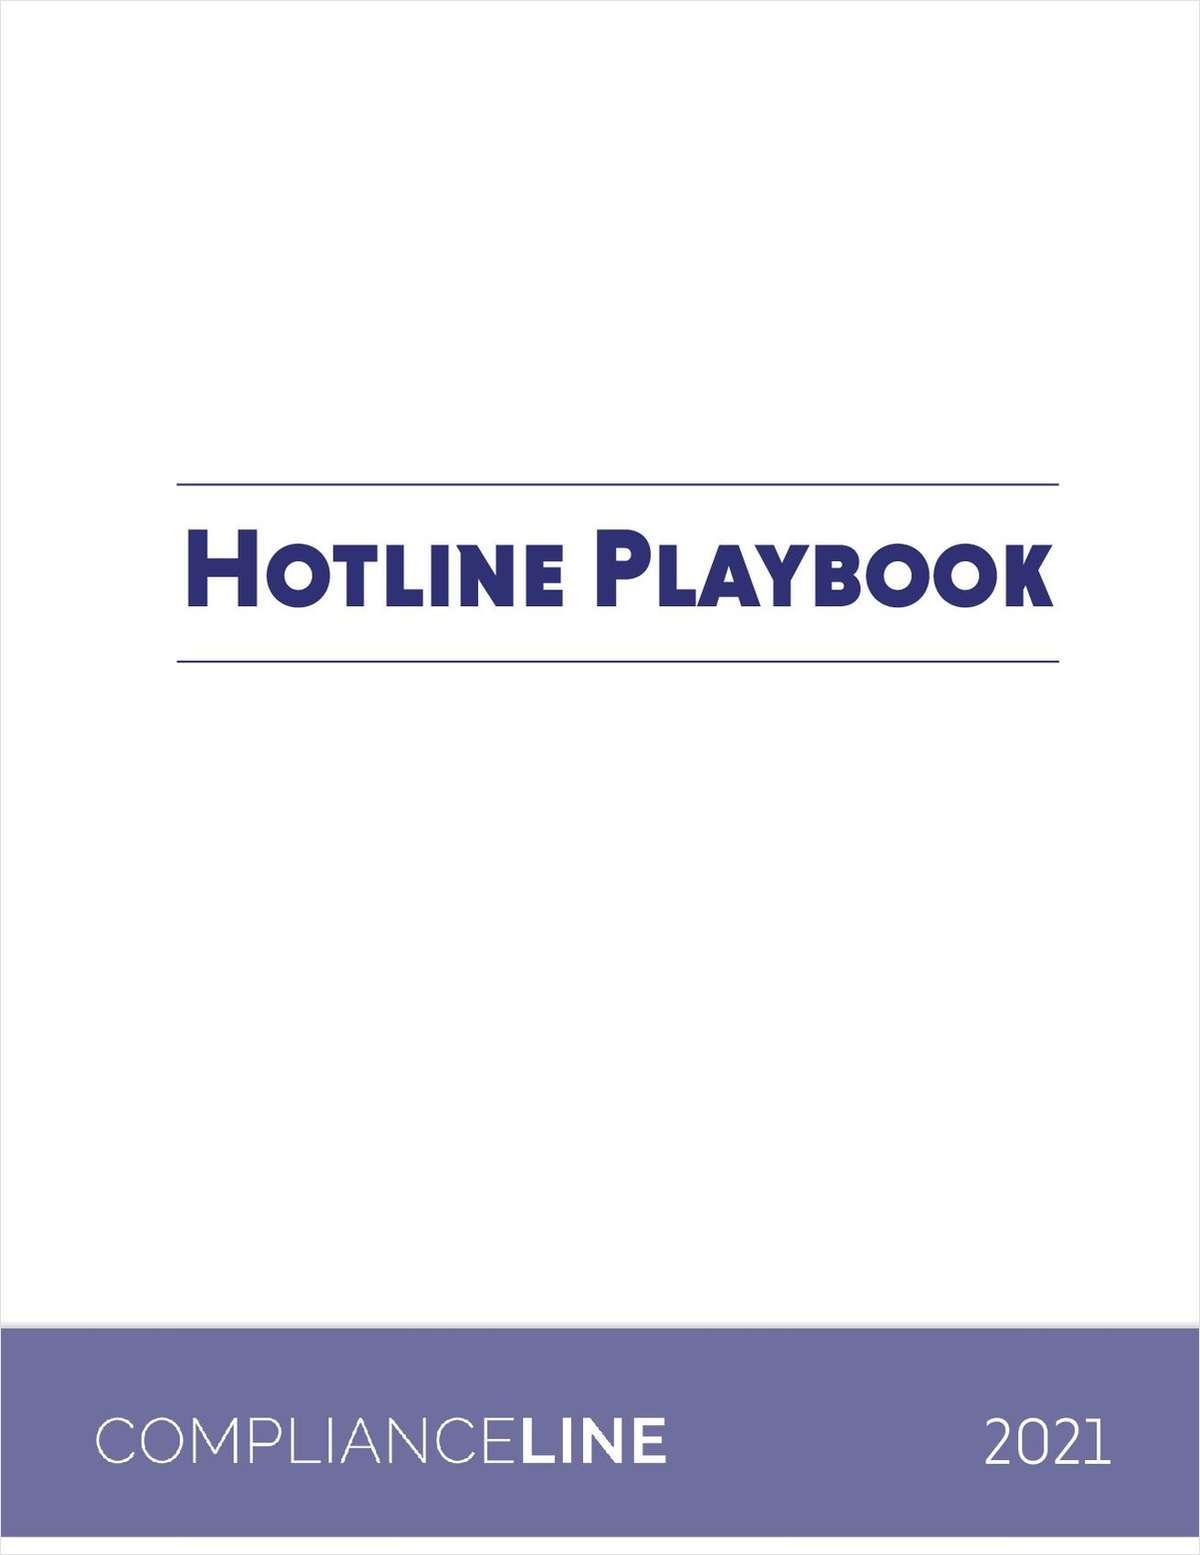 Hotline Playbook